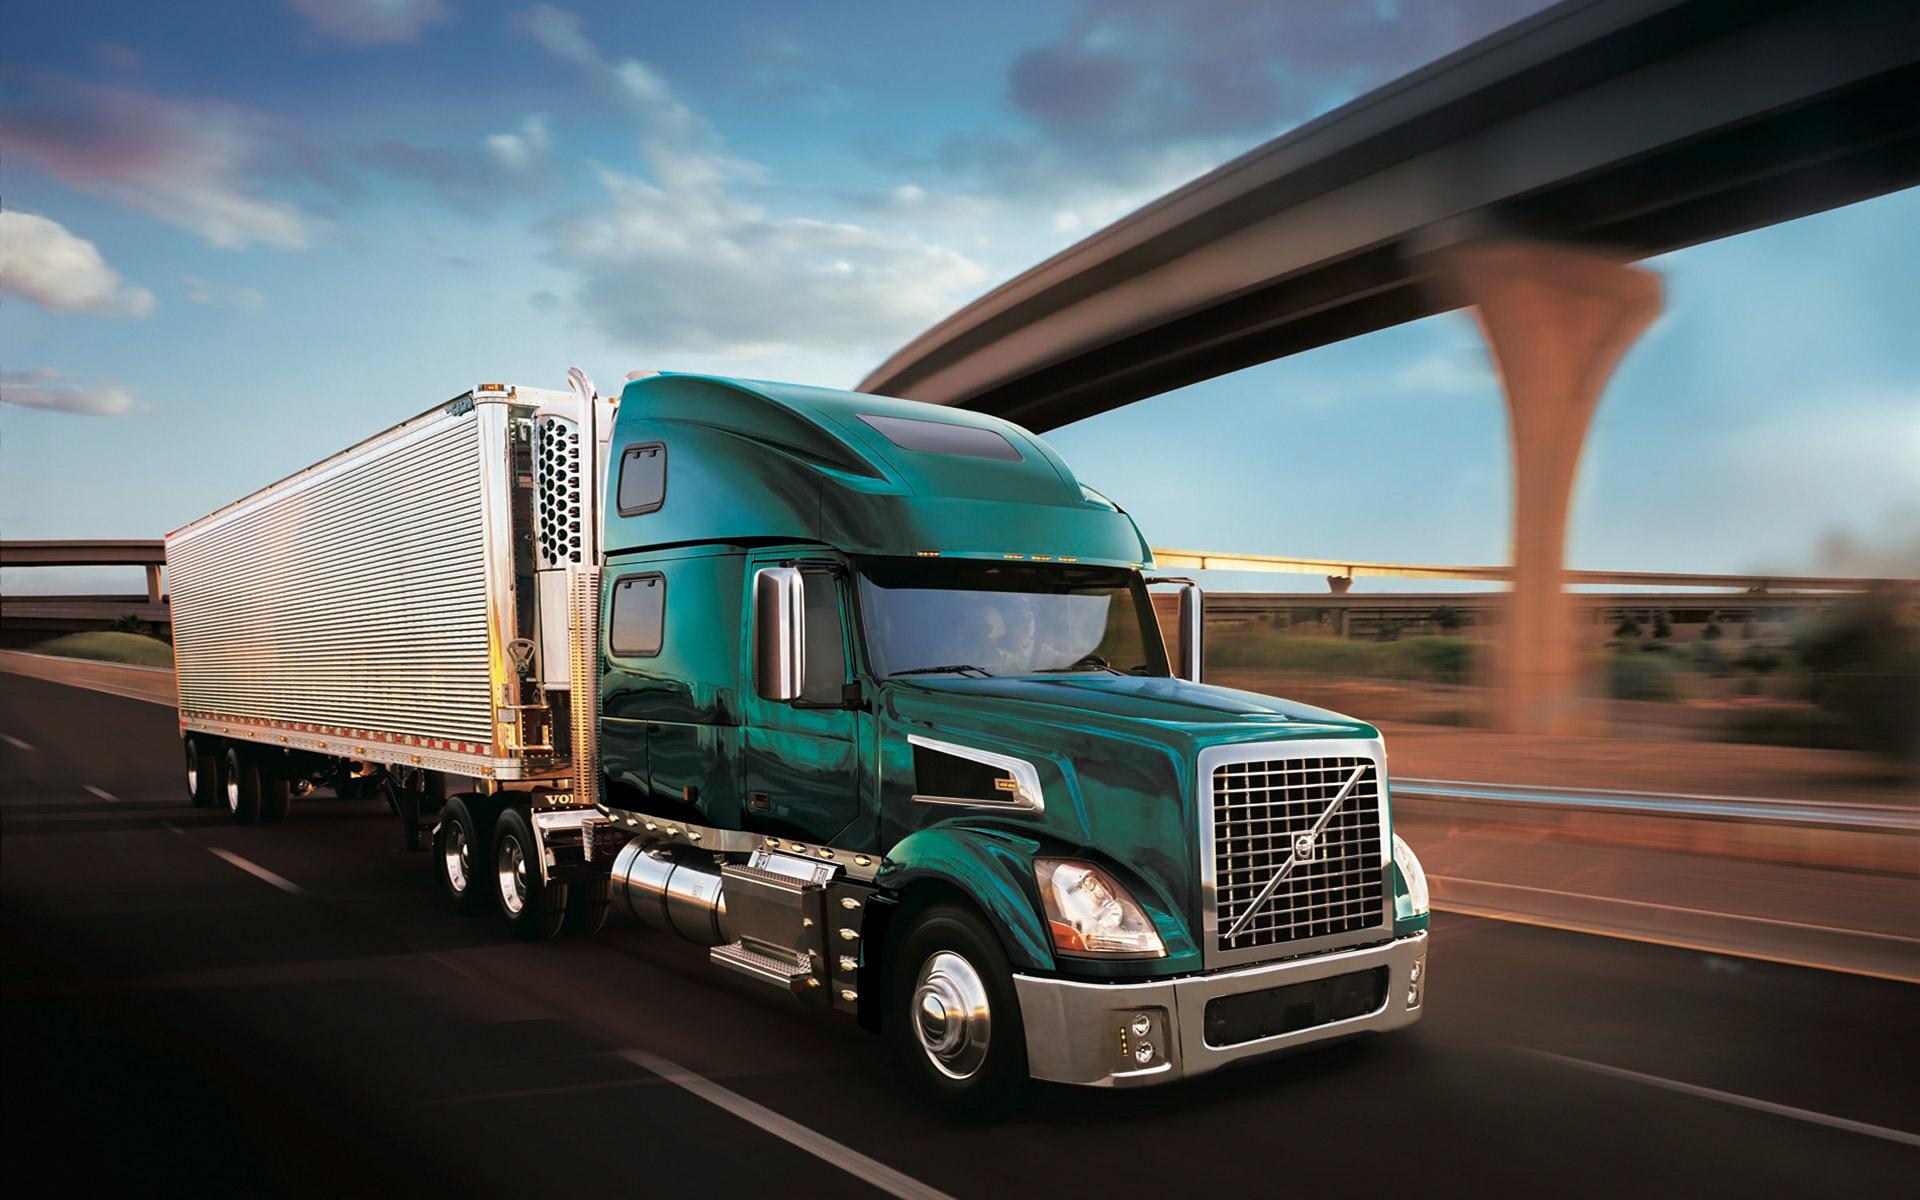 vehicles Heavy duty trucks 1920x1200 Wallpaper 29   Wallcoonet 1920x1200